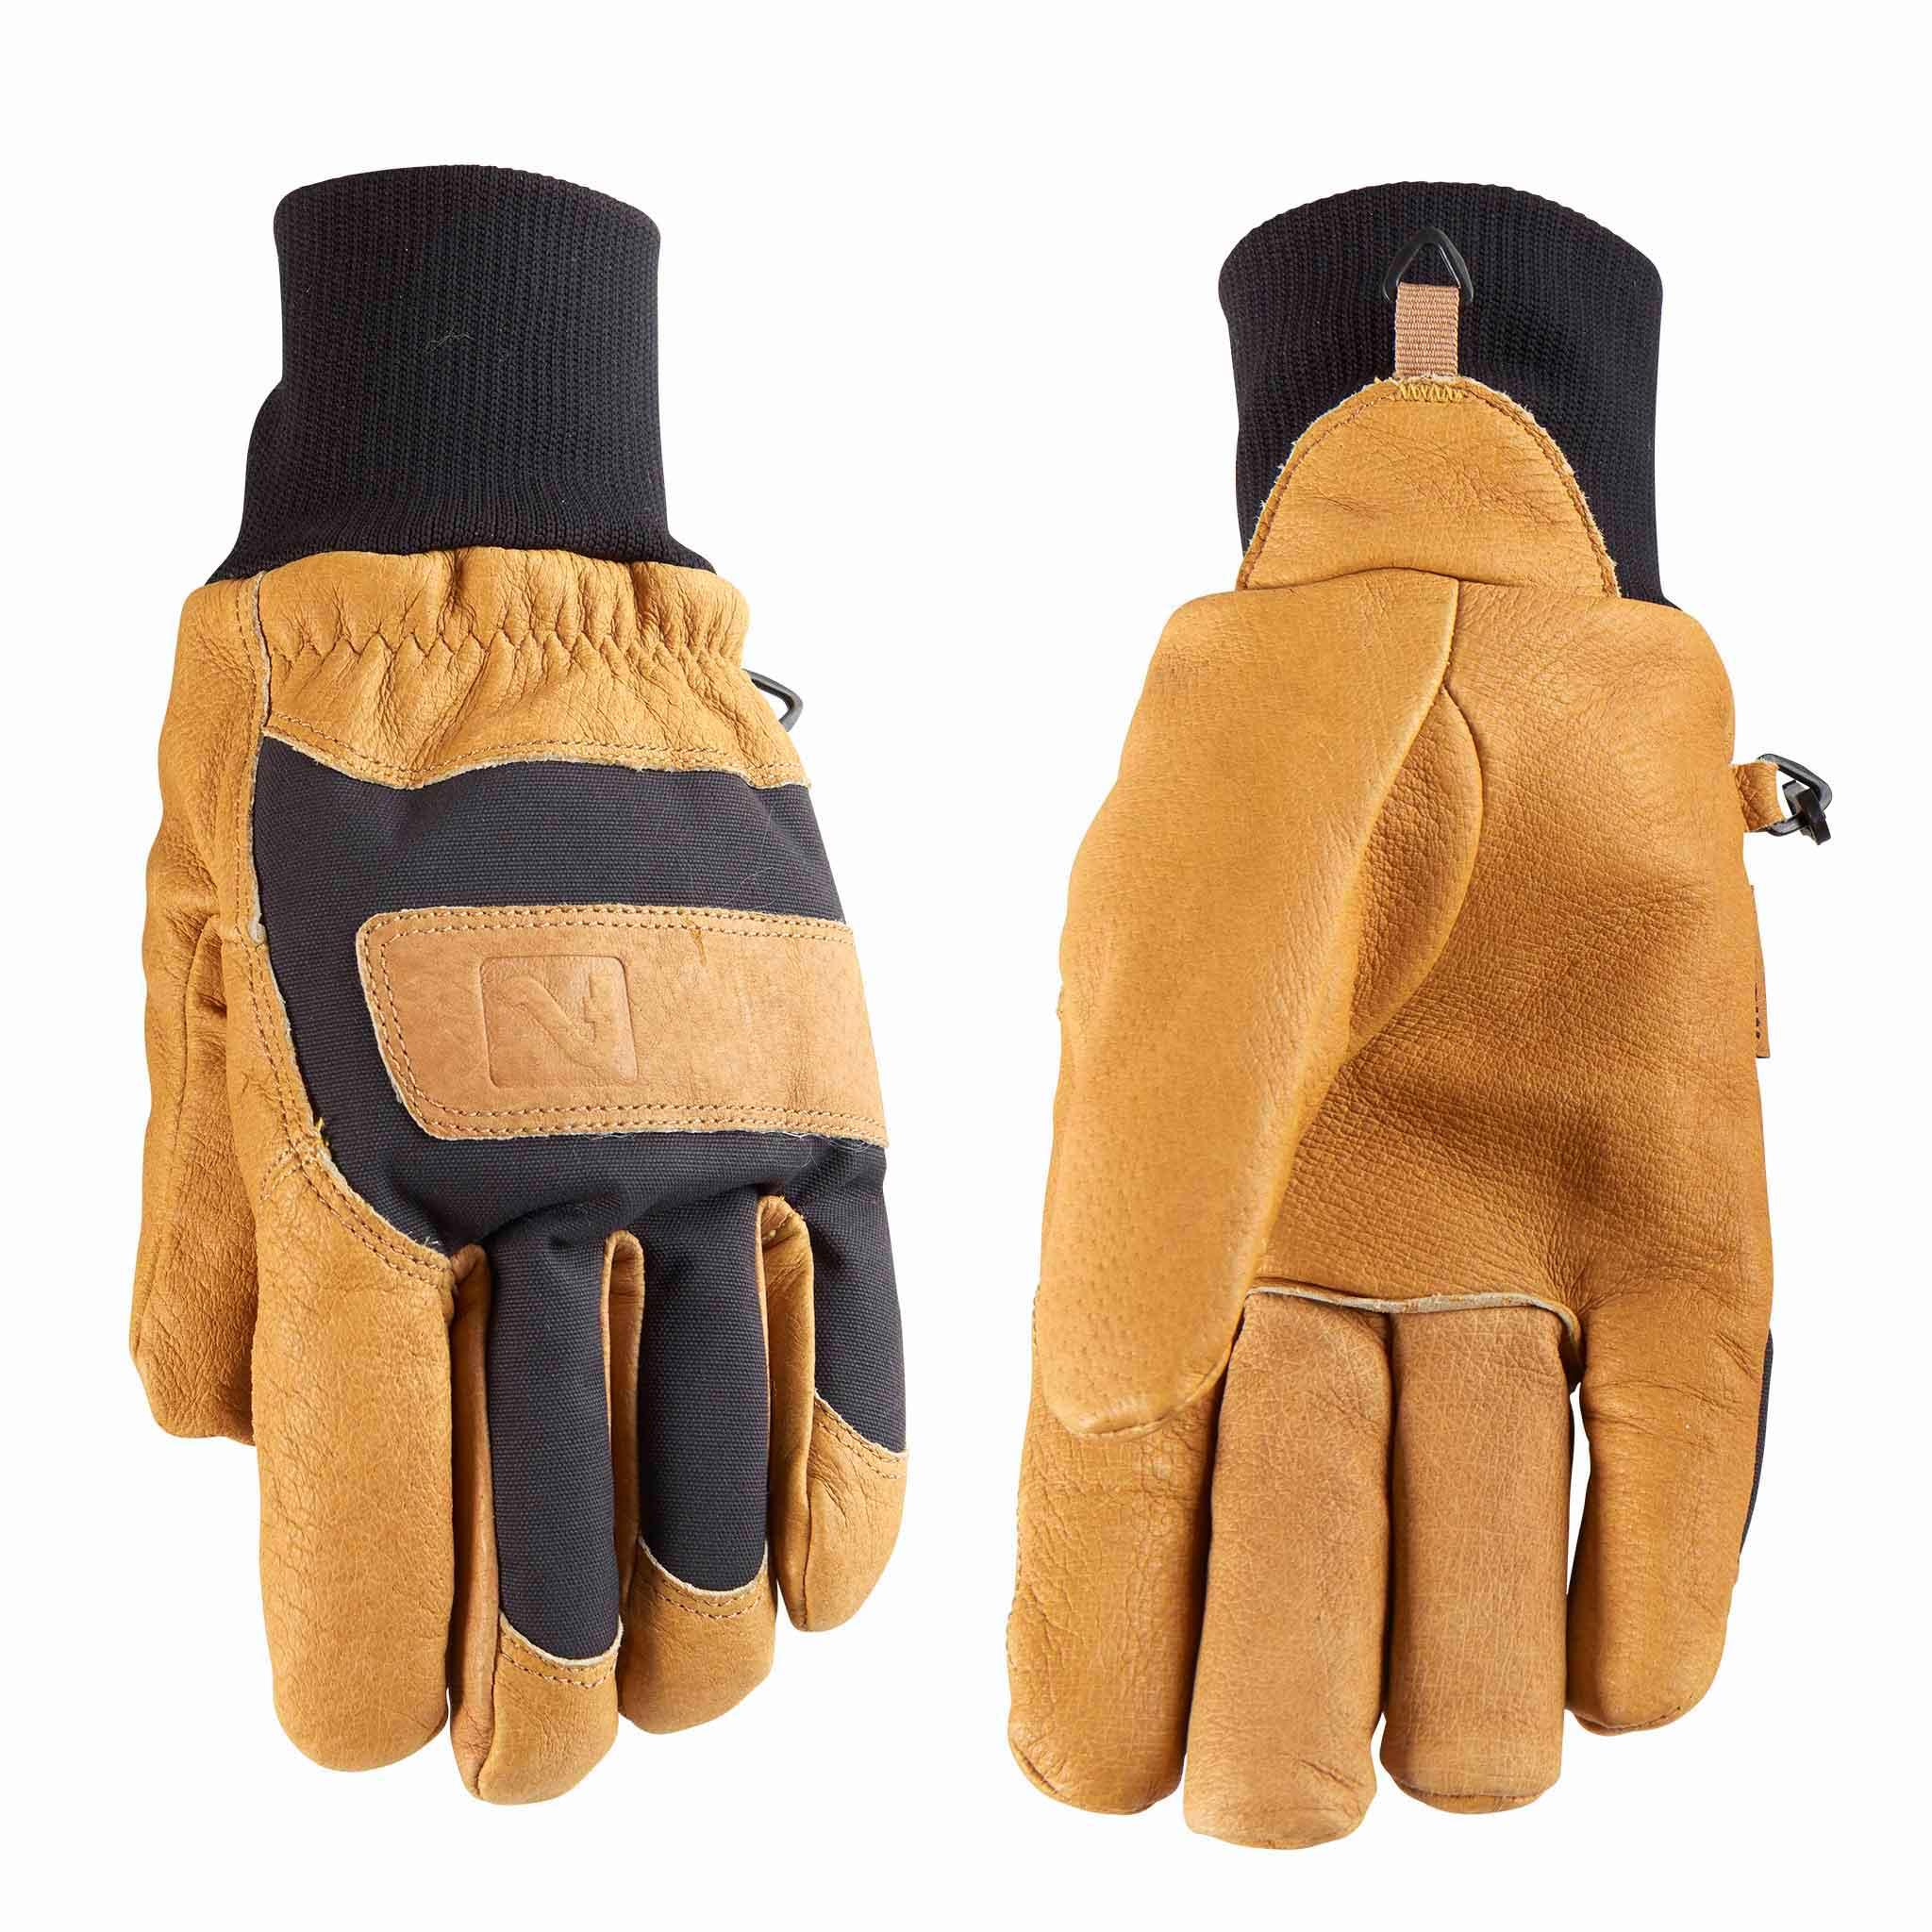 Choosing leather gloves